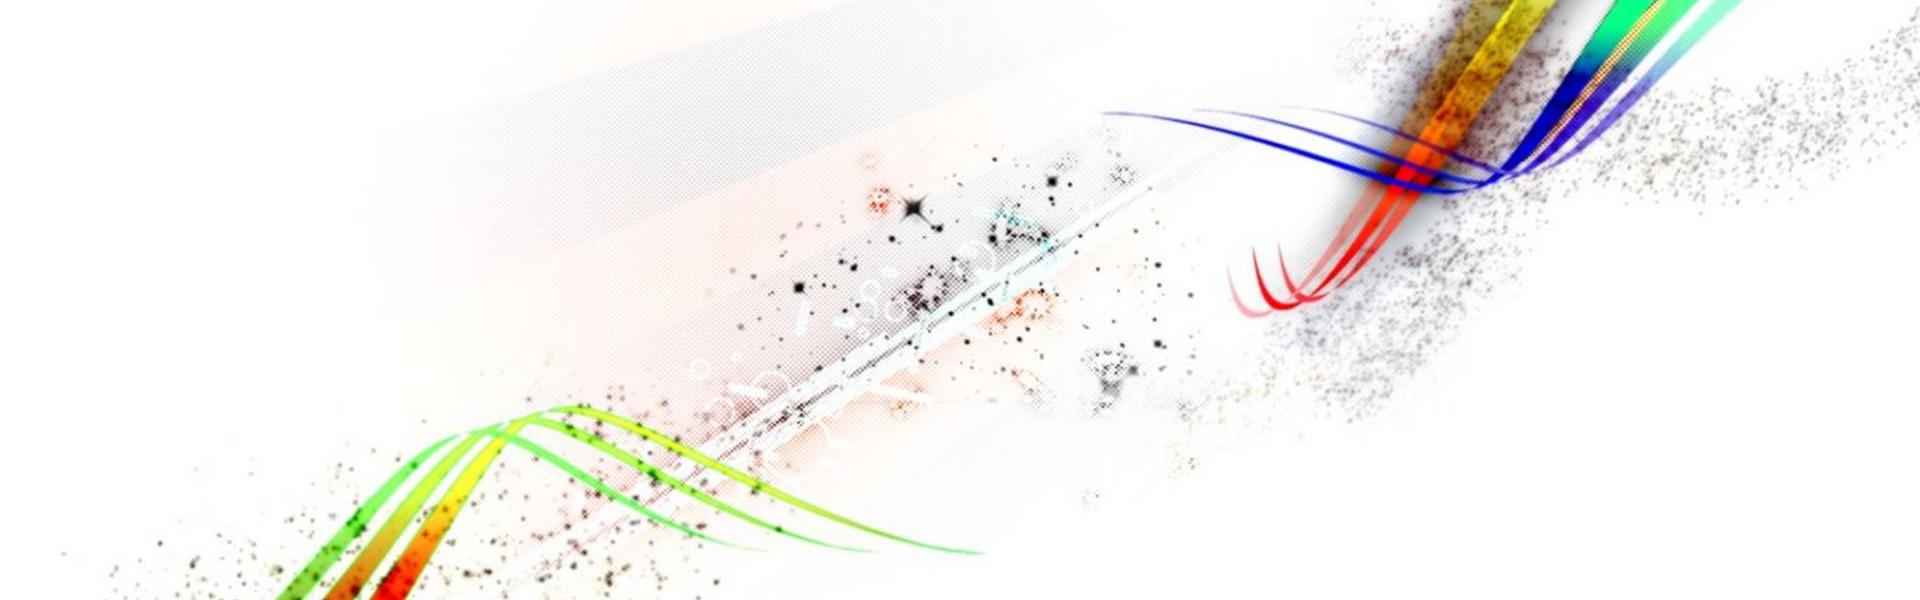 slider-2-grafik-zagreb